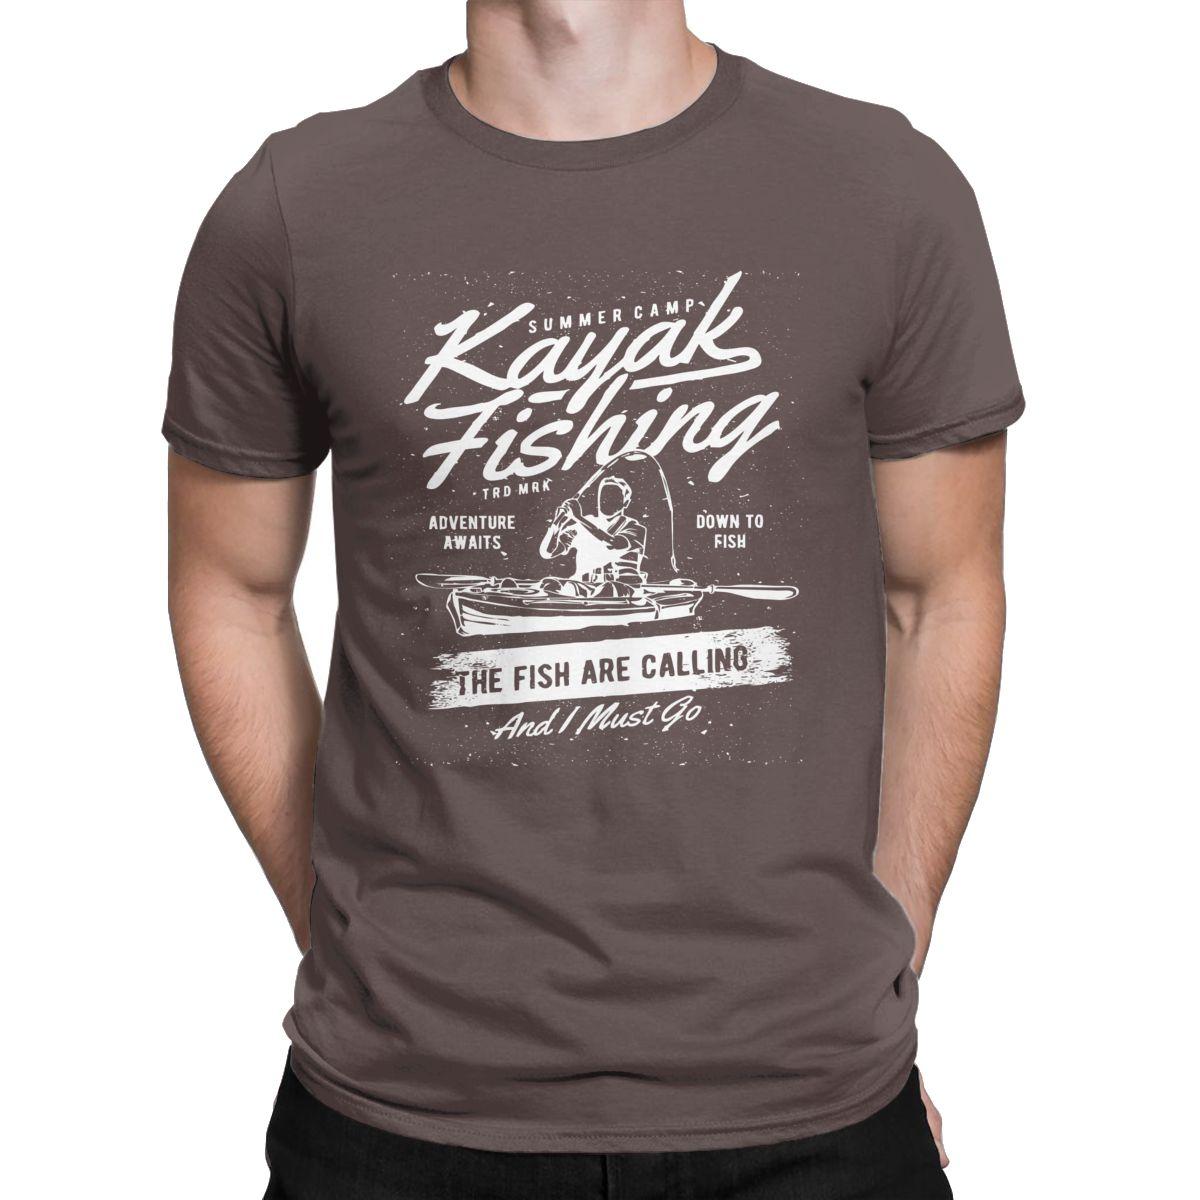 Kayak Fishing The Fish Are Calling T Shirts Men Humorous T-Shirt Round Neck Funny Fisherman Tees Short Sleeve Clothing Plus Size